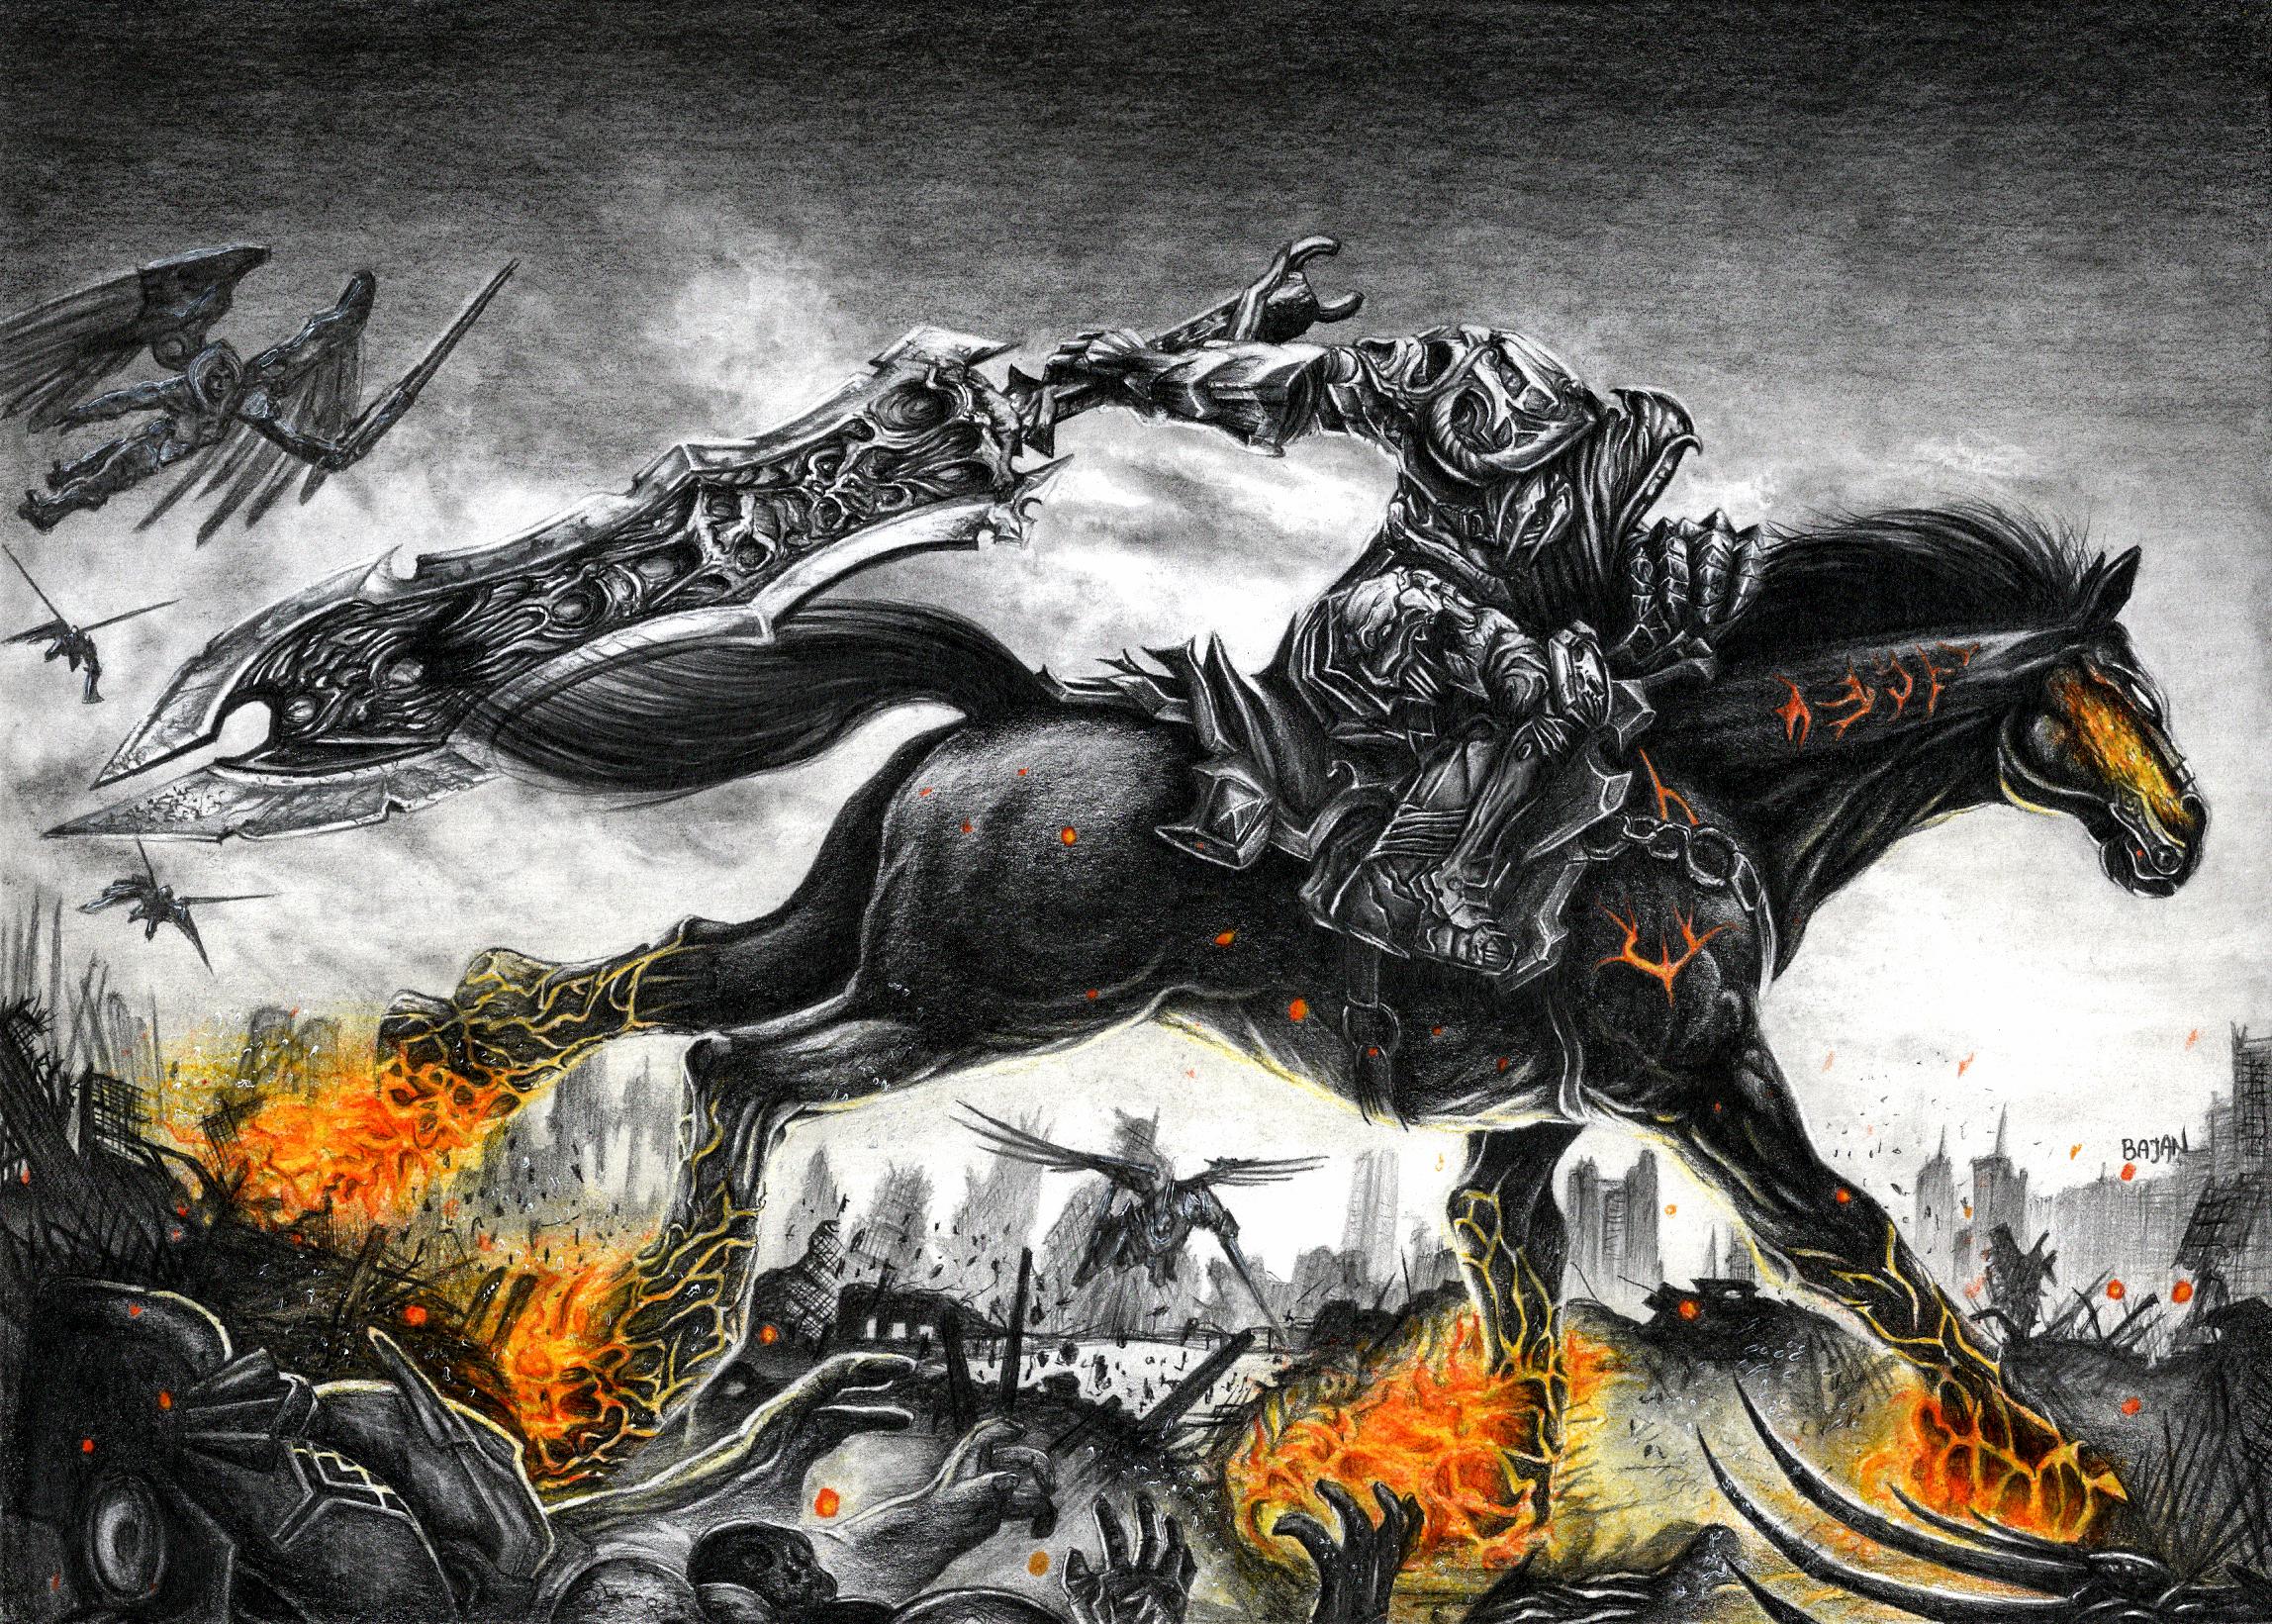 Darksiders War Drawing by Bajan-Art on DeviantArt